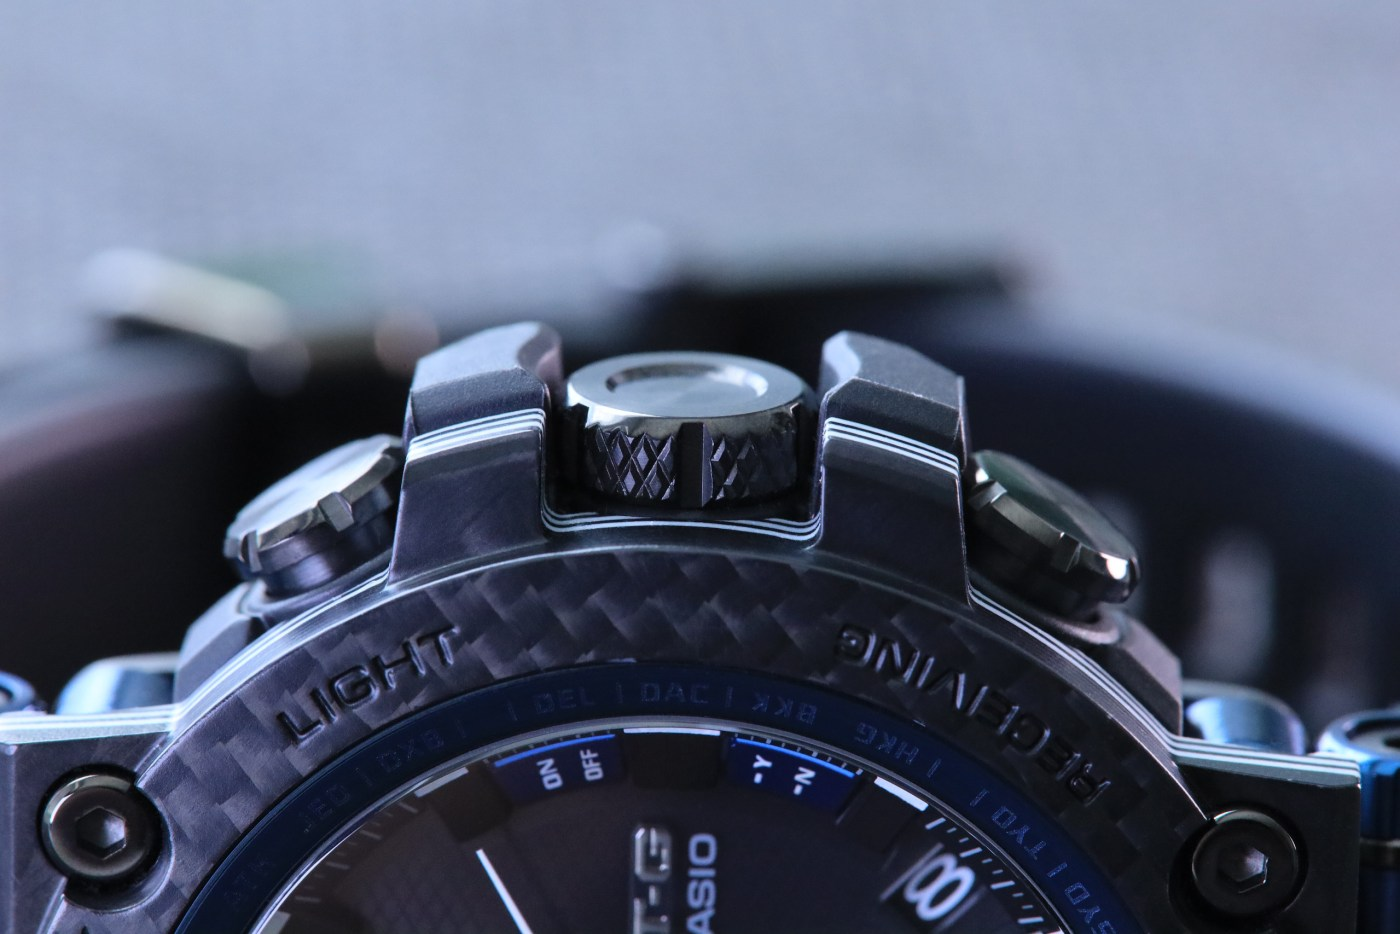 G-Shock MT-G Carbon Fiber MTGB1000XB-1A crown detail